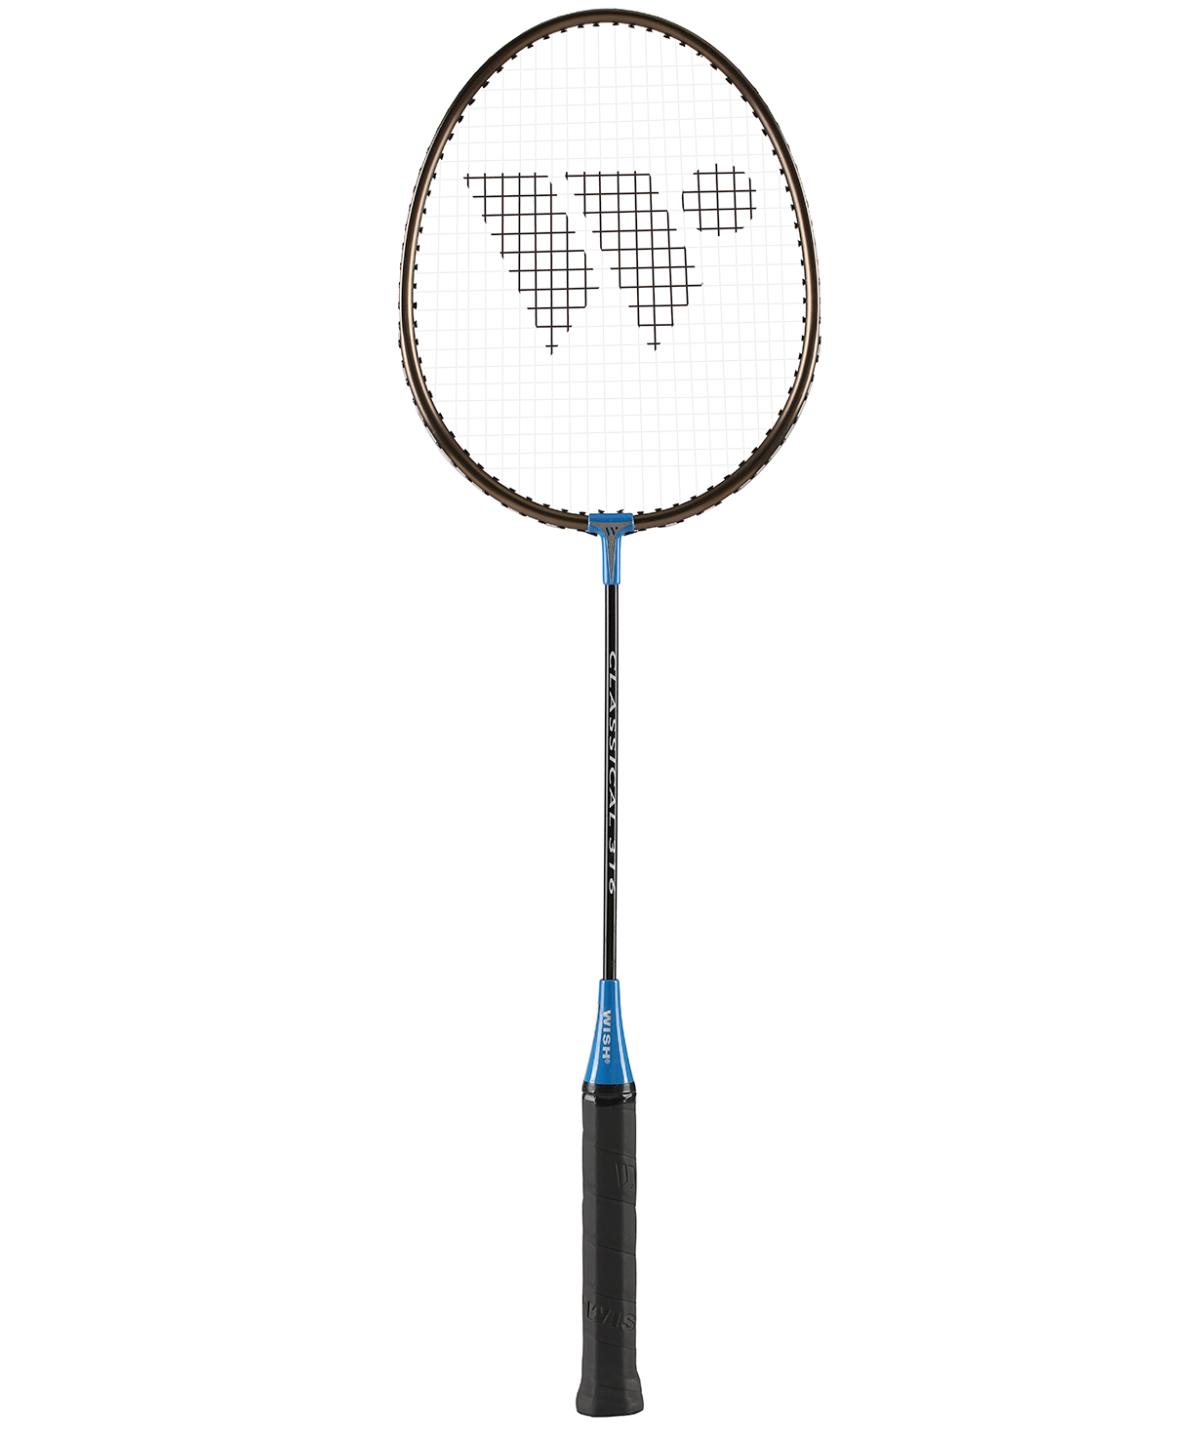 WISH Classic Набор для бадминтона   316: синий - 3